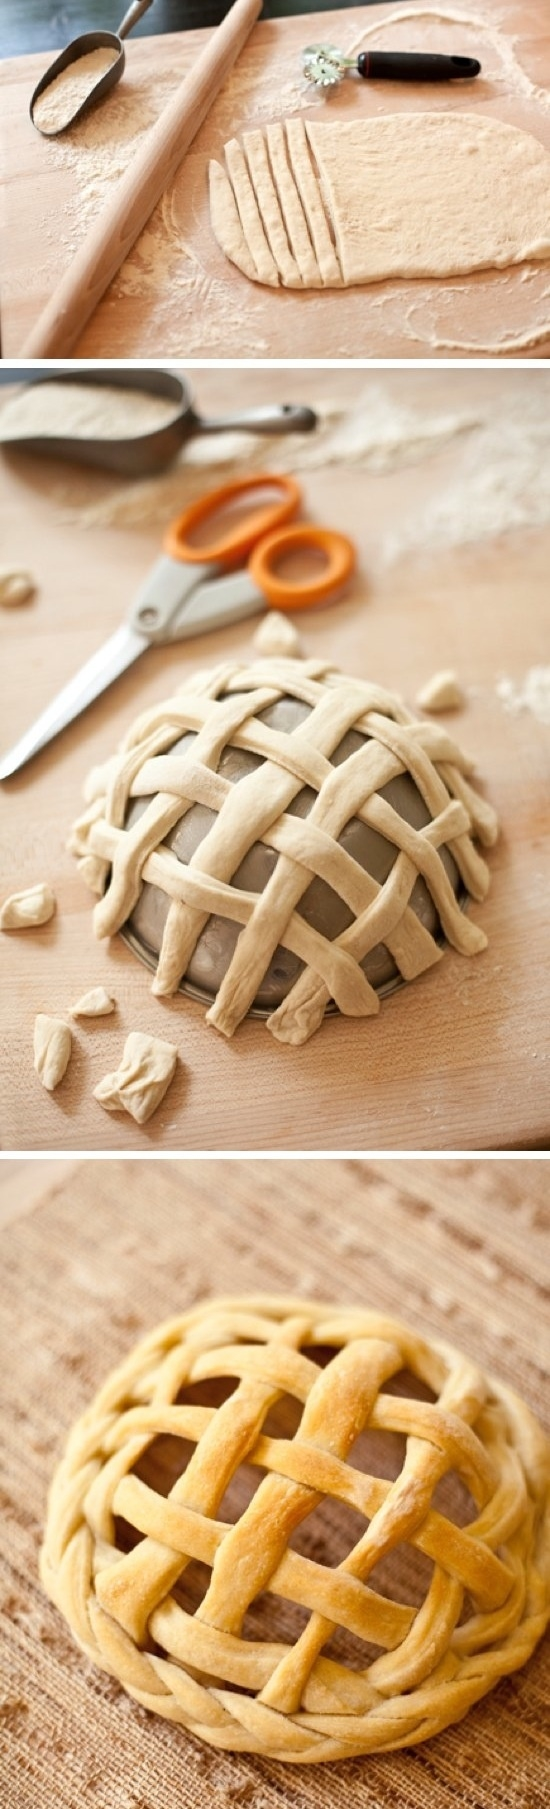 DIY Bread Basket diy recipe craft crafts craft ideas diy crafts easy diy diy recipes craft food craft recipes